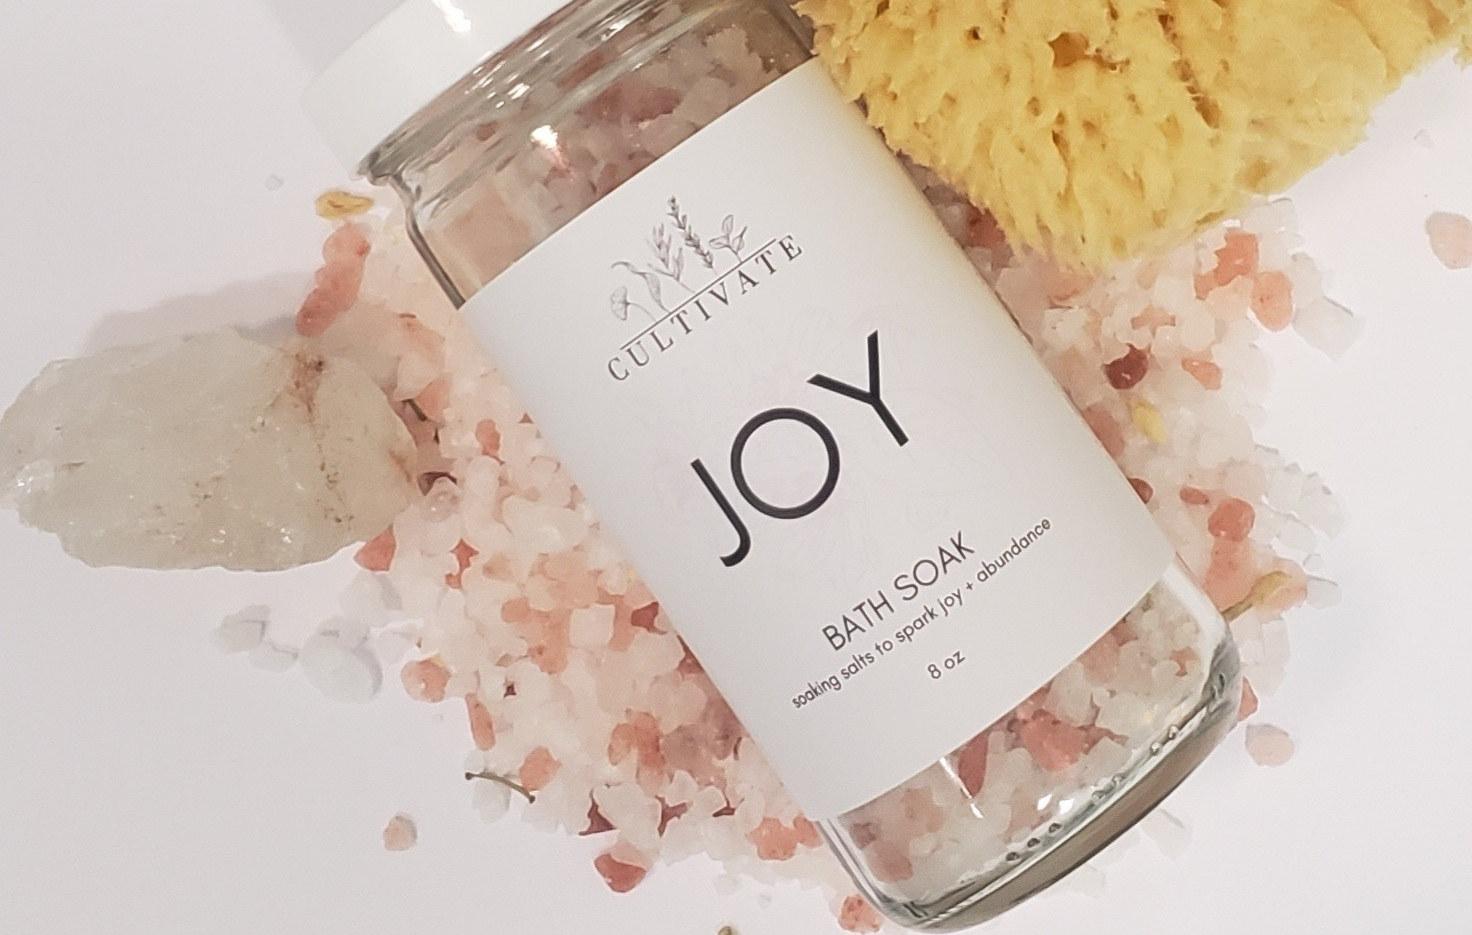 cultivate joy bath soak